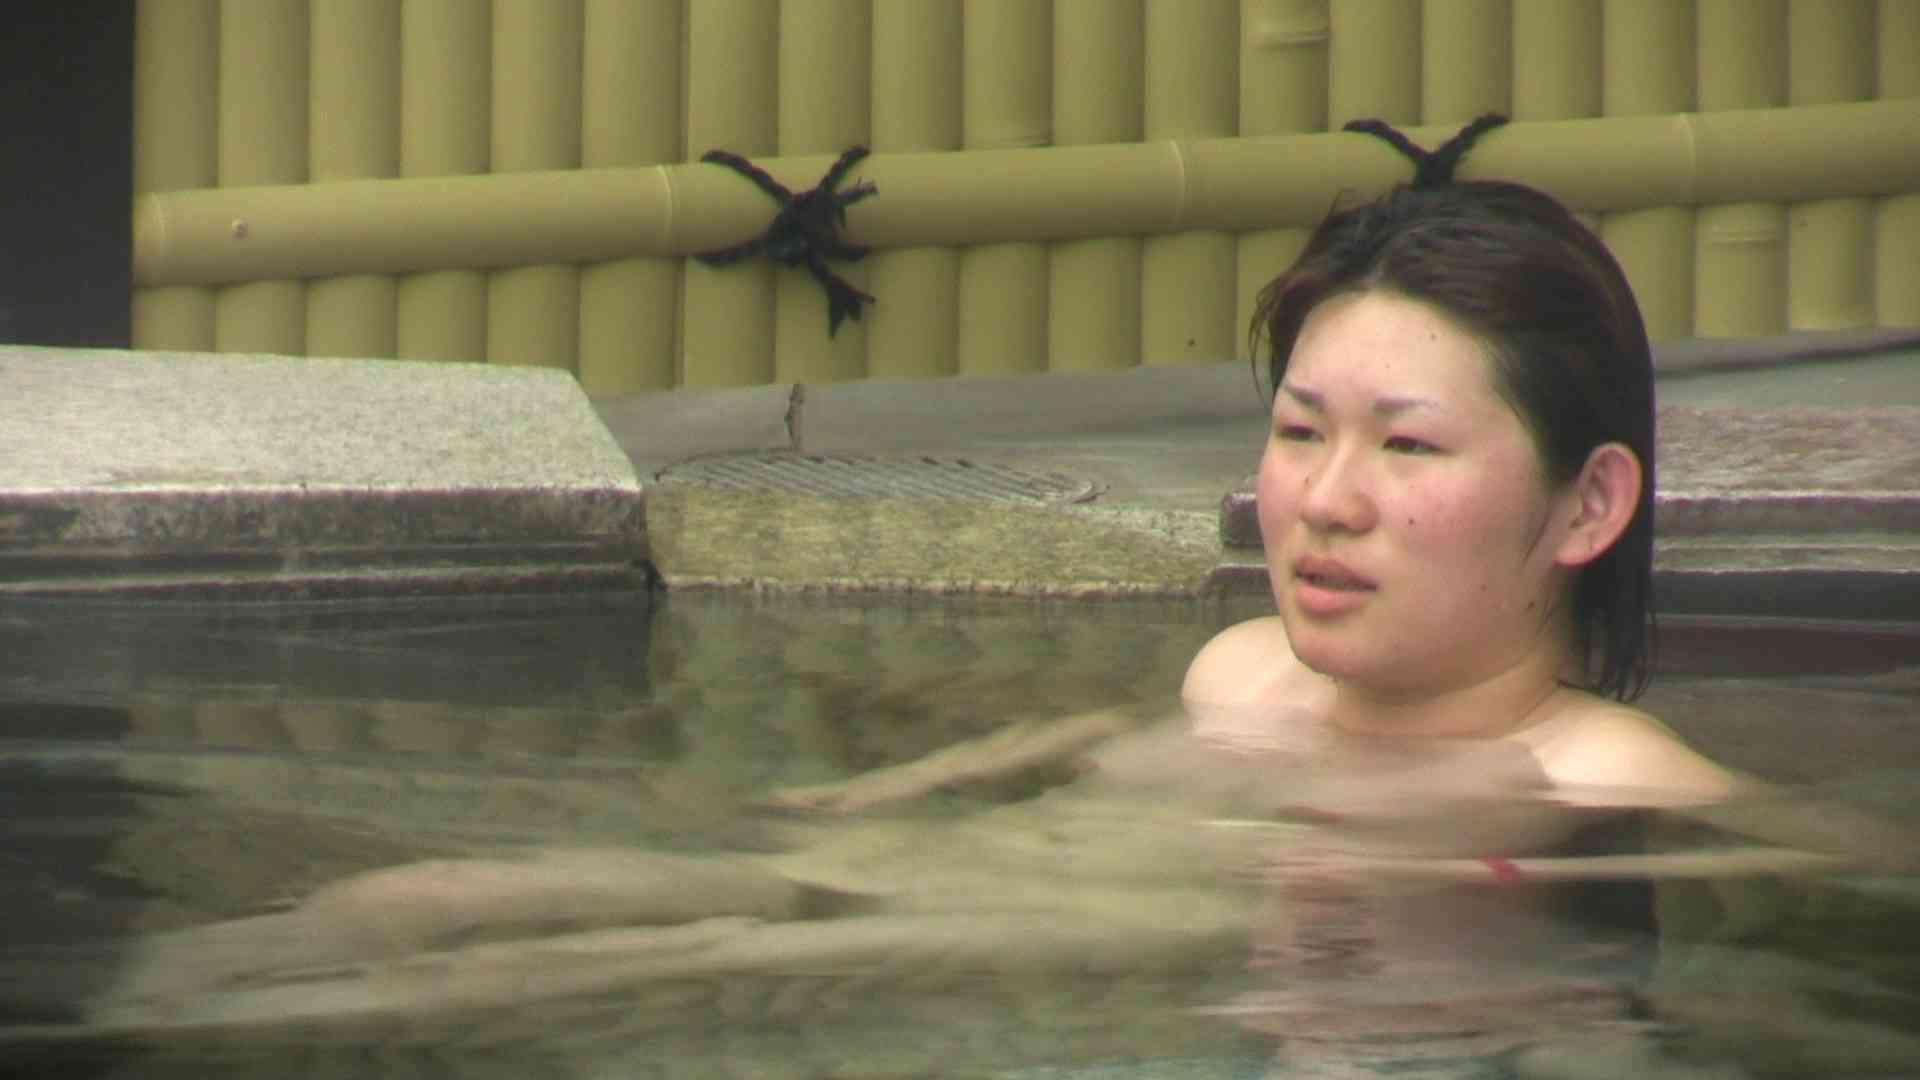 Aquaな露天風呂Vol.673 露天風呂 | OLのエロ生活  45連発 34